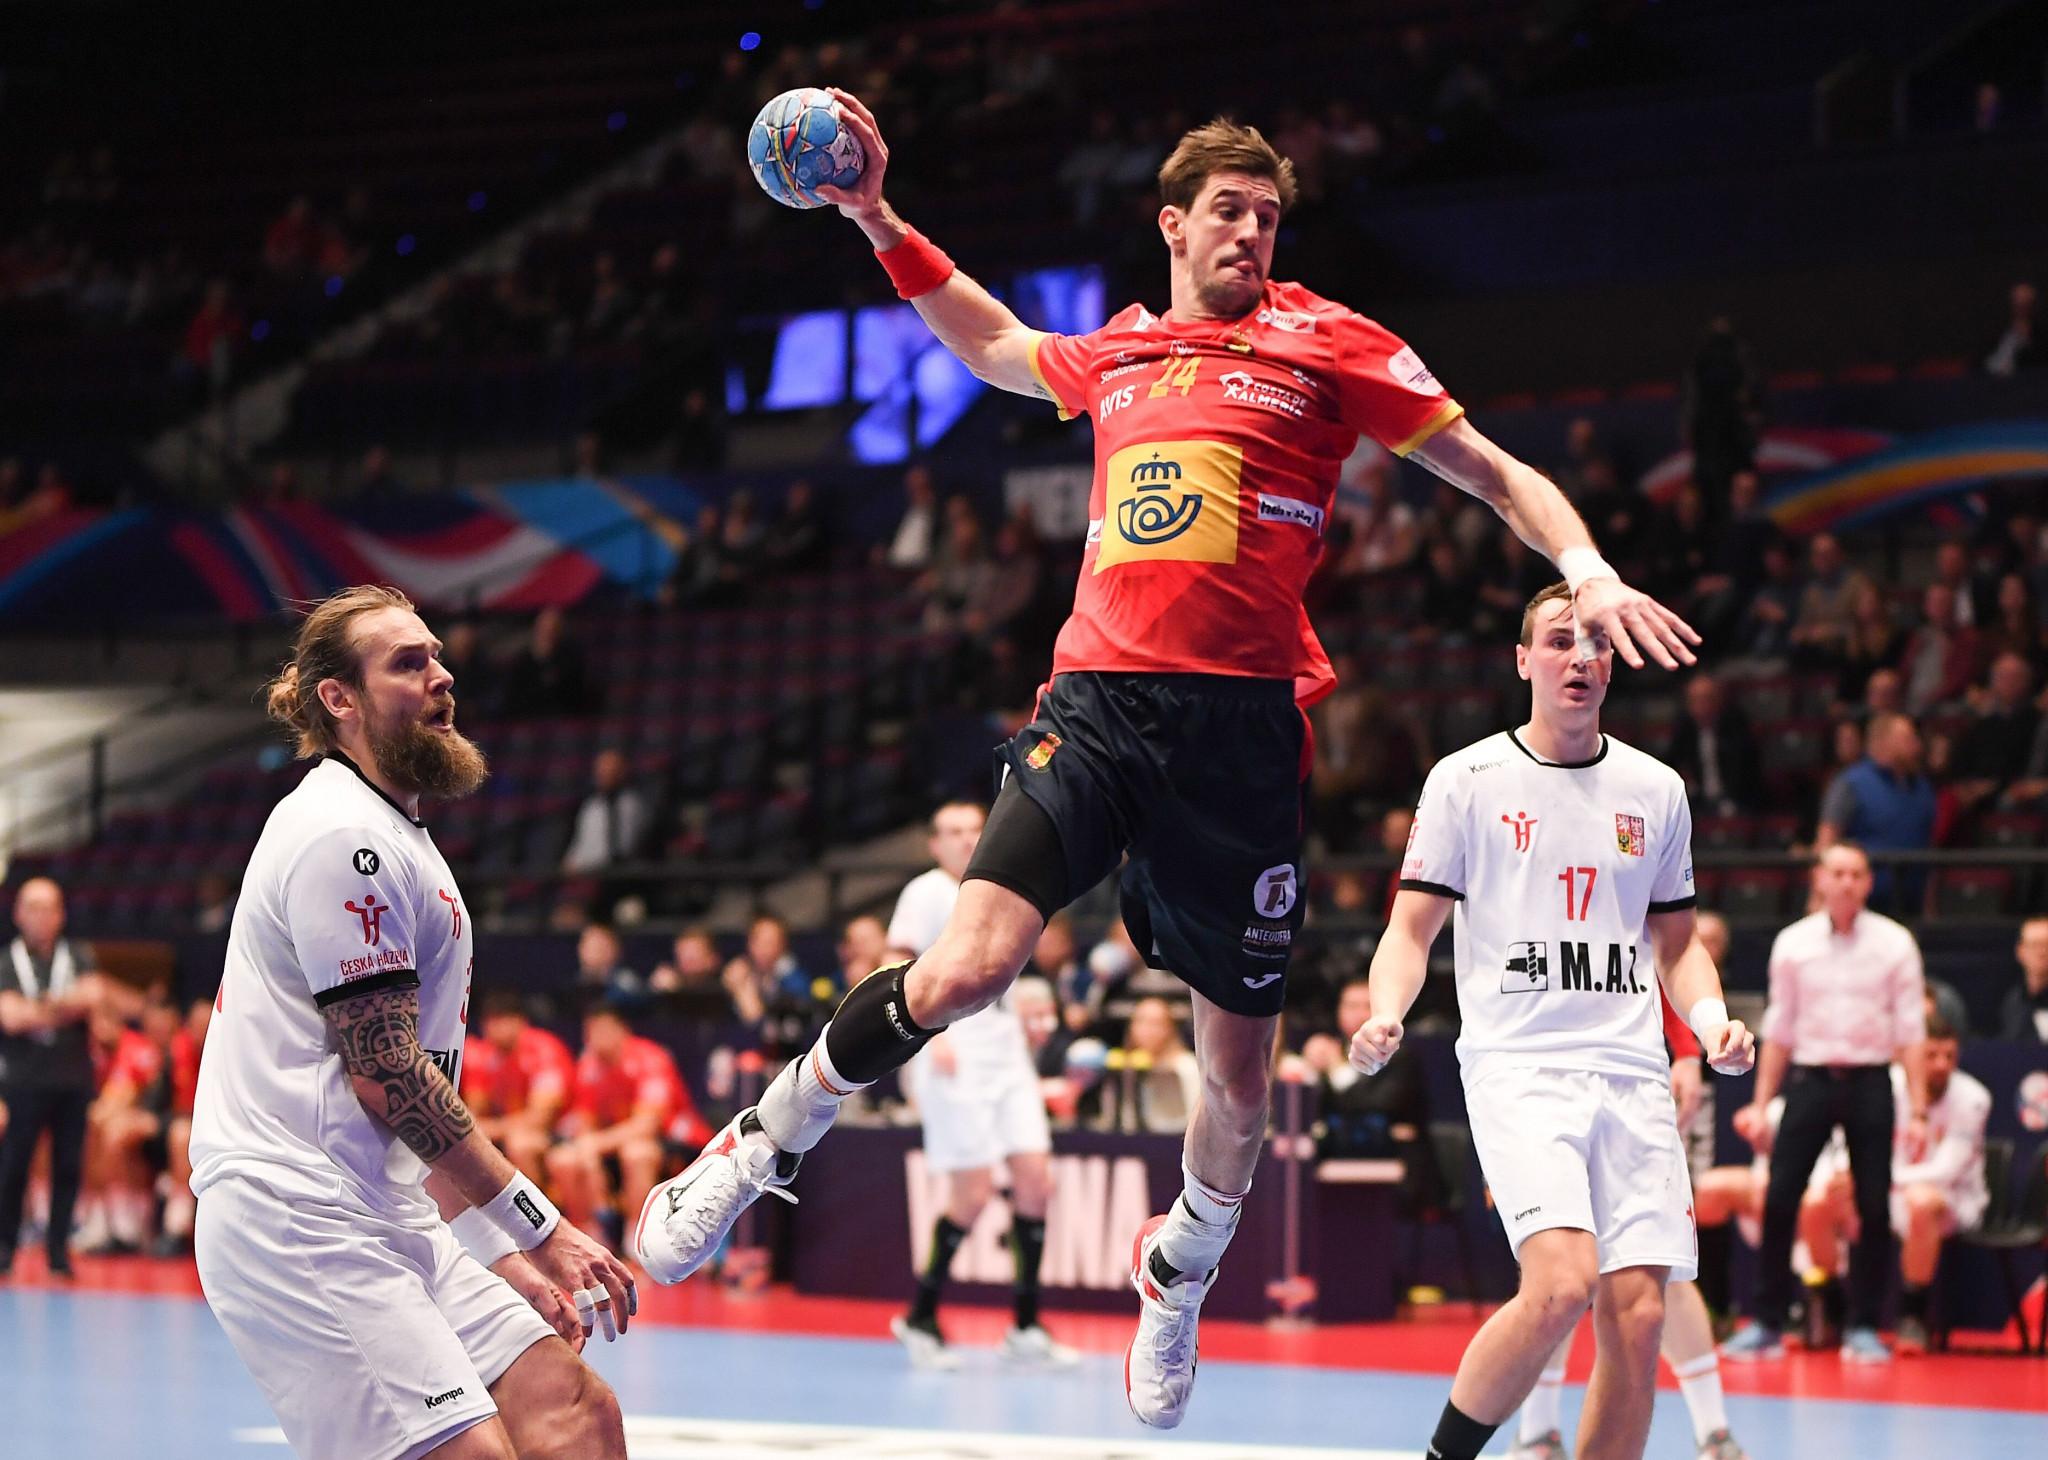 Spain looking good in defence of EHF European Men's Handball Championship